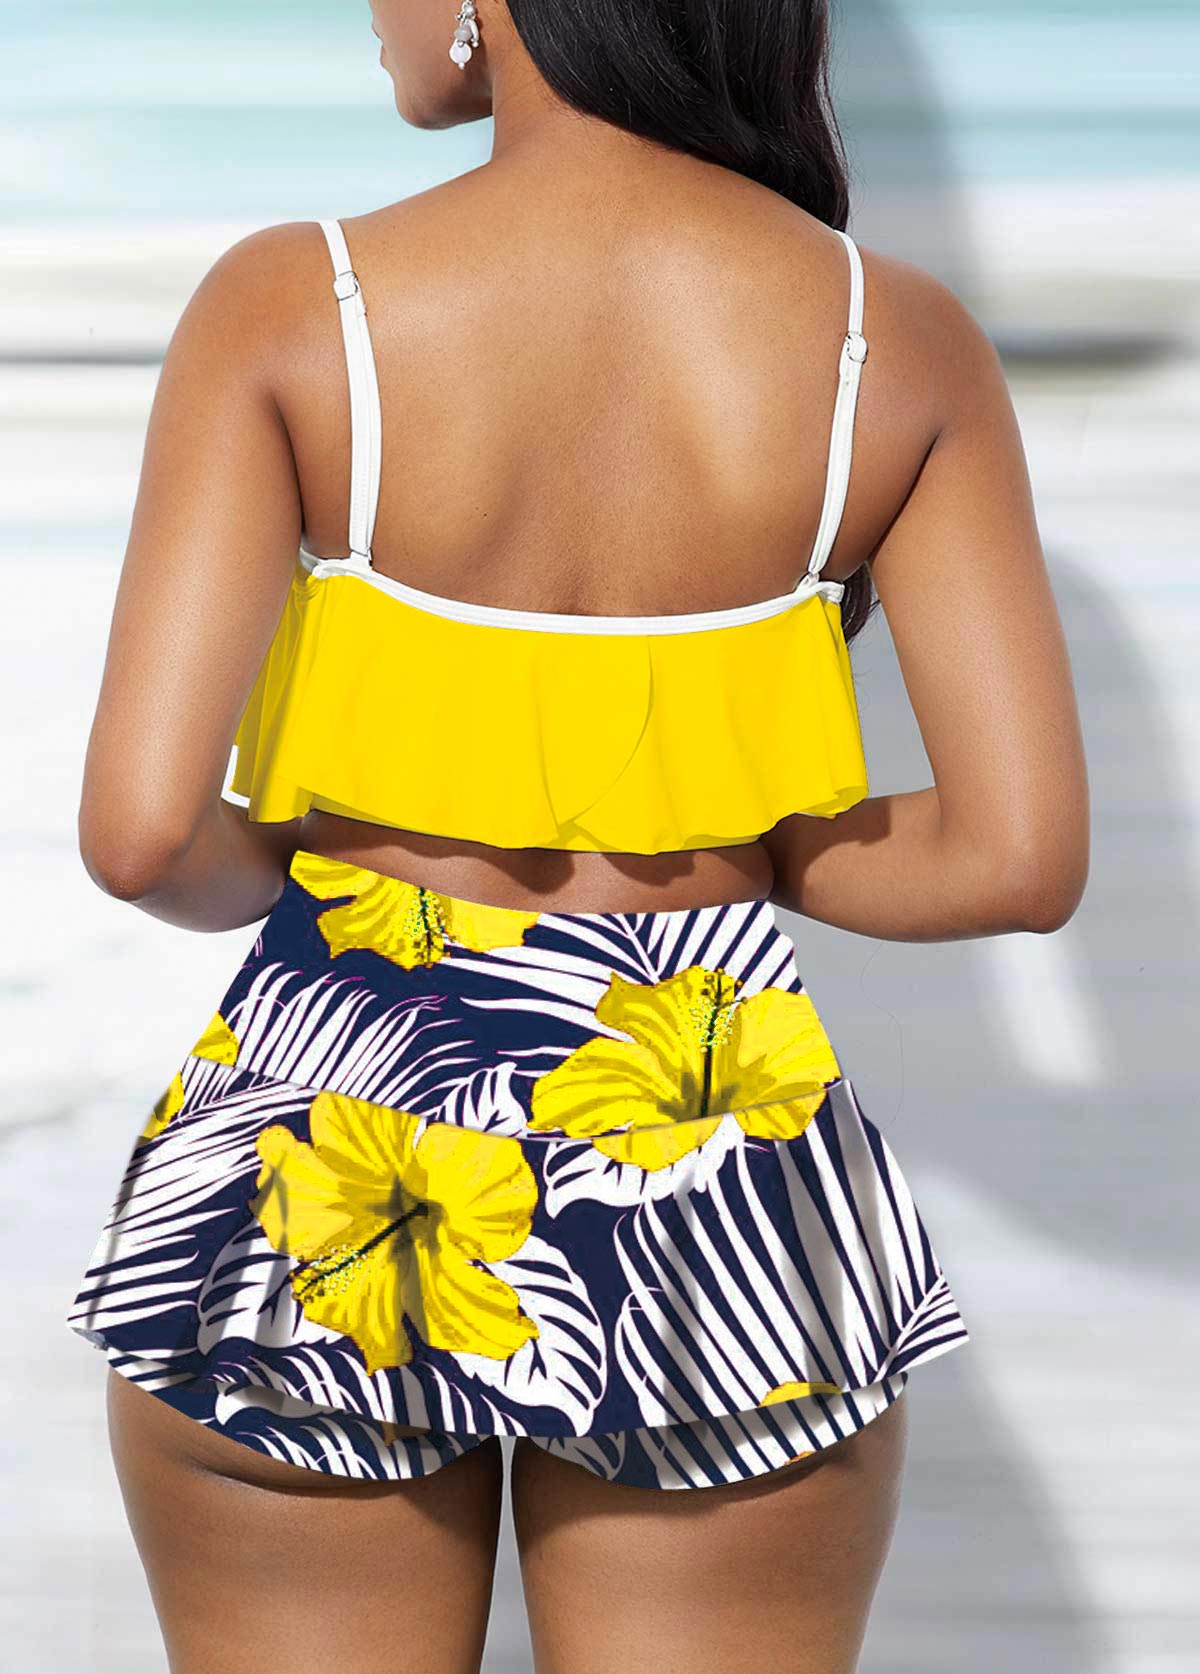 Ruffle Overlay Swimwear Top and Floral Print High Waisted Pantskirt